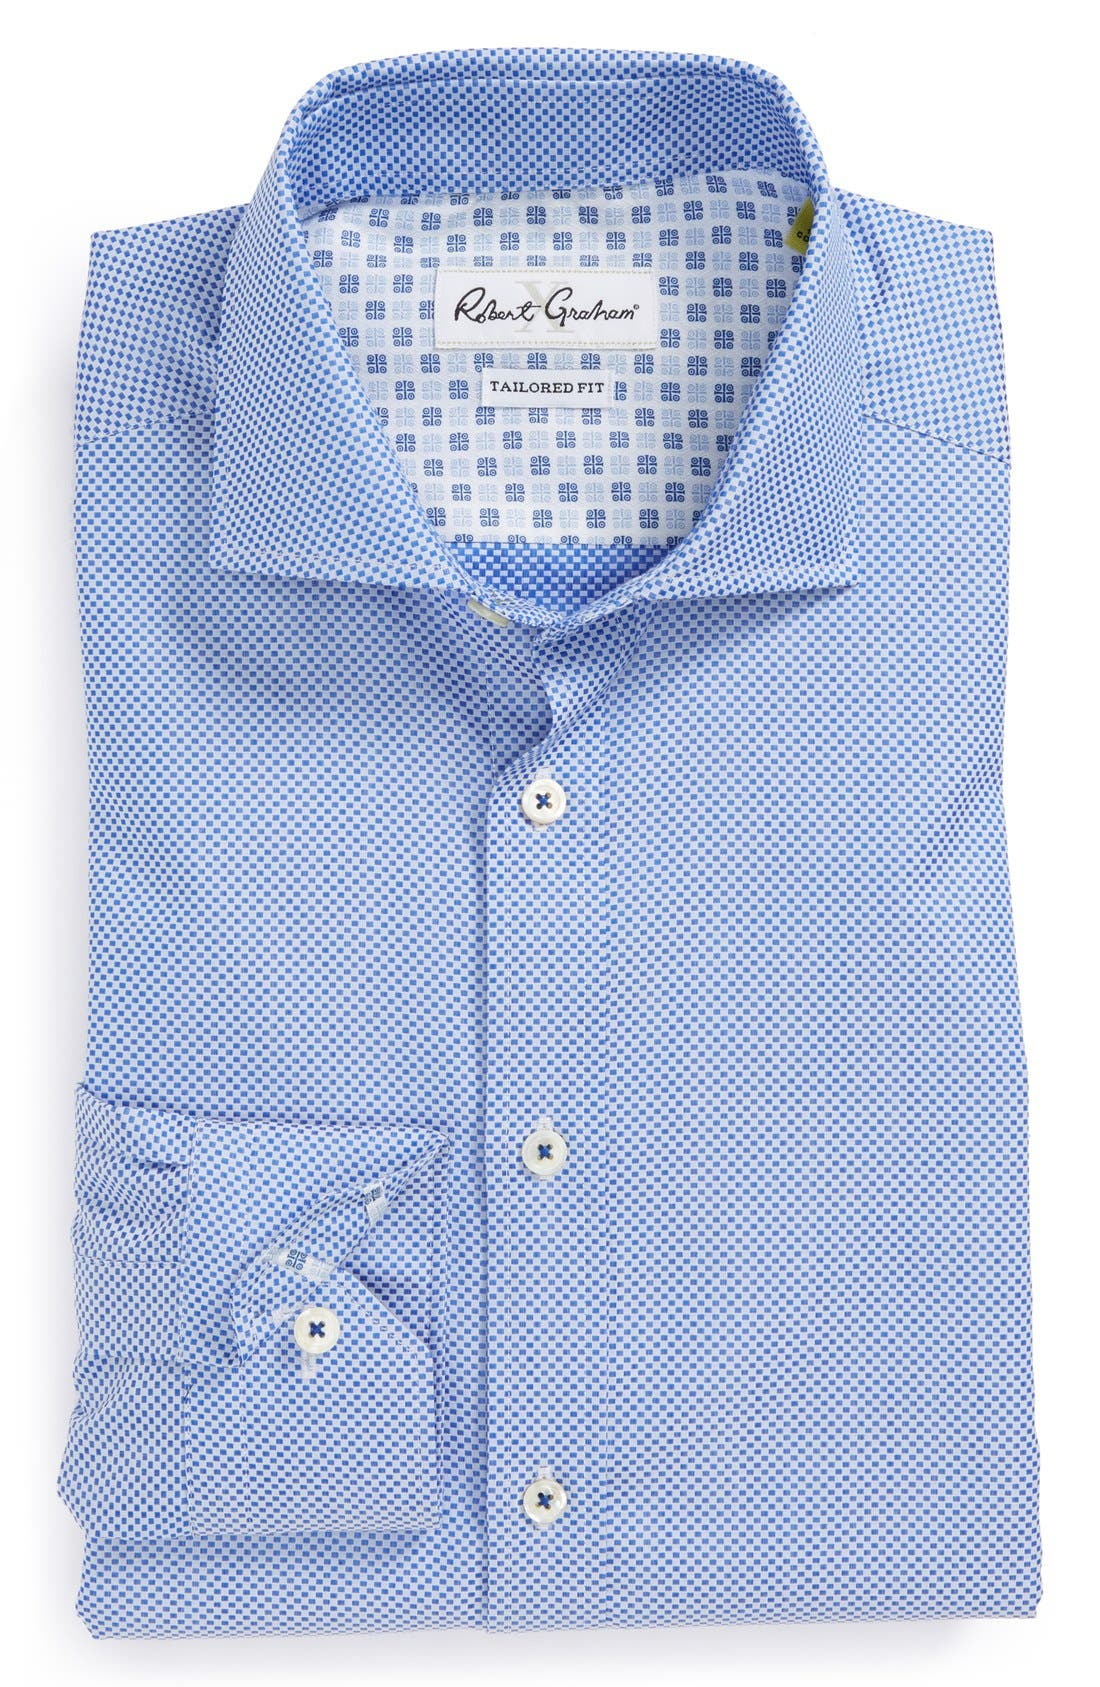 Alternate Image 1 Selected - Robert Graham 'Bologna' Tailored Fit Dot Dress Shirt